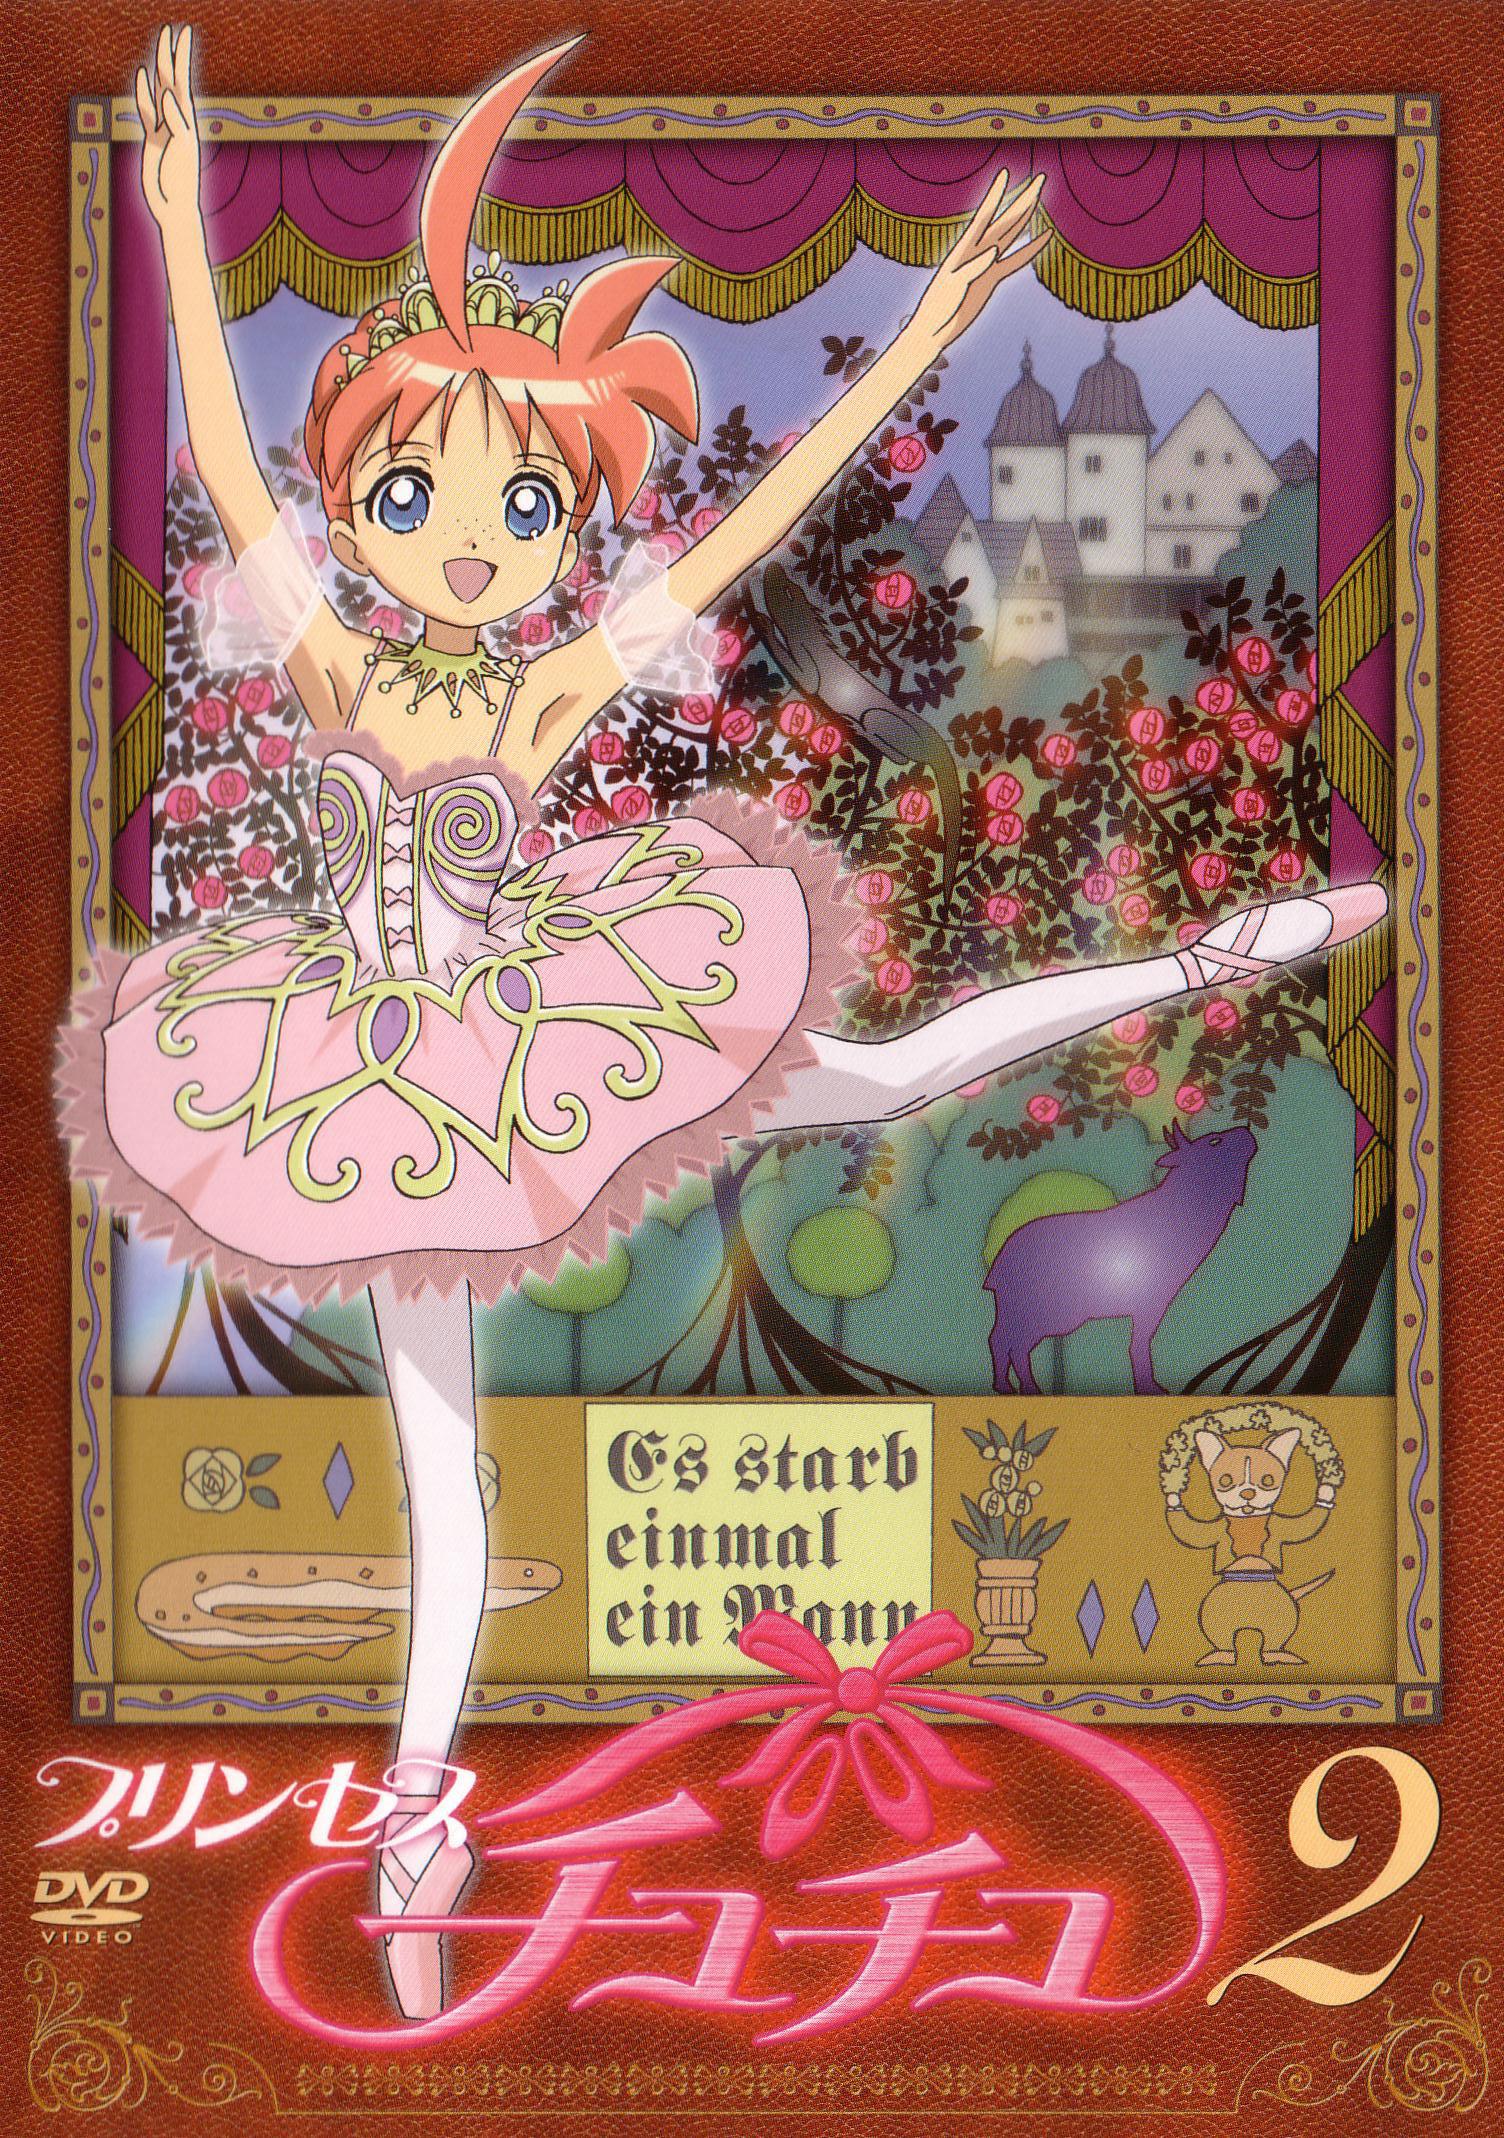 Princess Tutu Vol. 2